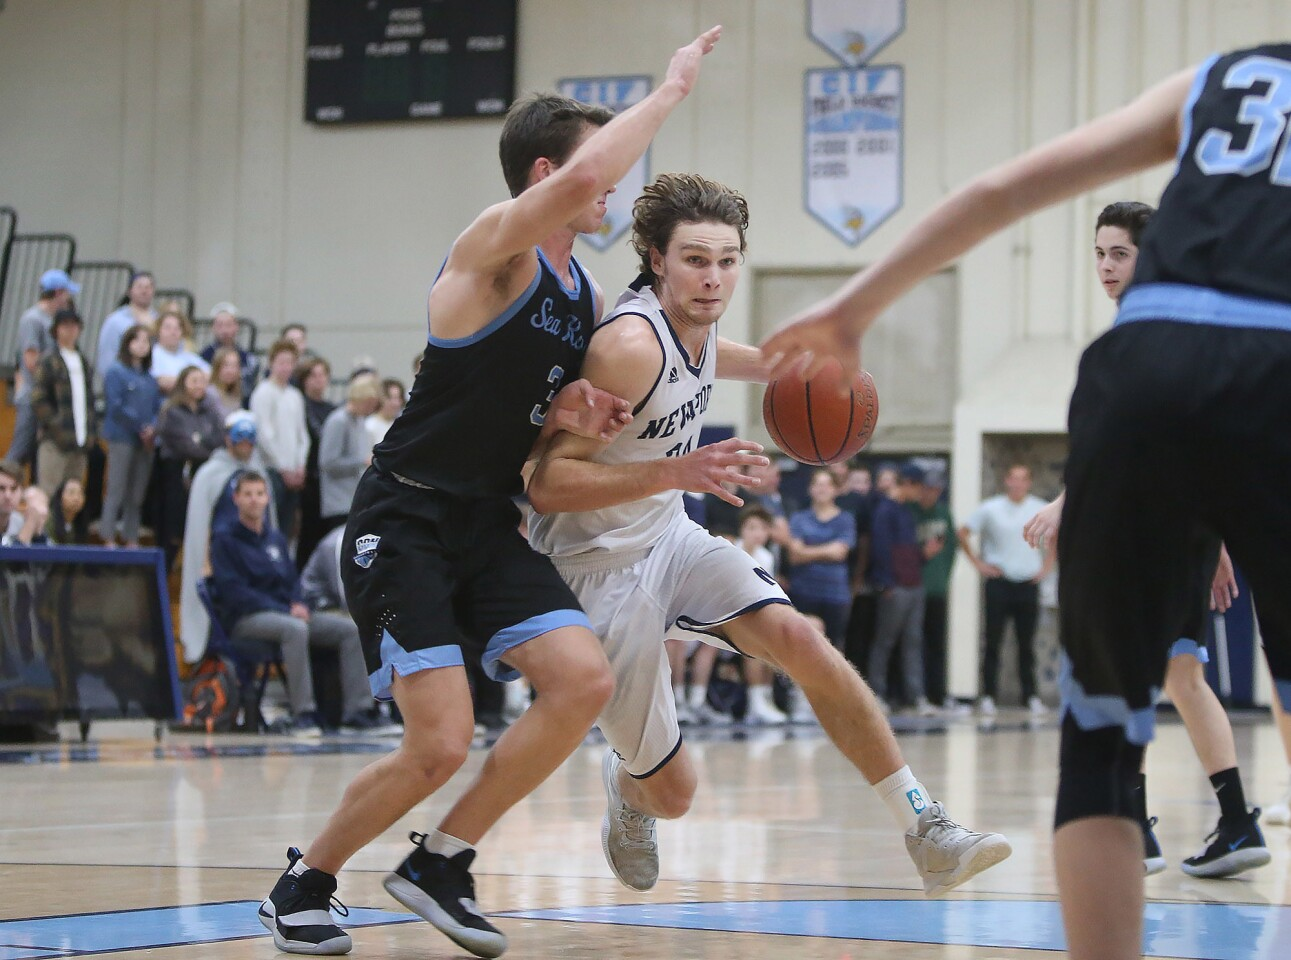 Photo Gallery: Corona del Mar vs. Newport Harbor in boys' basketball